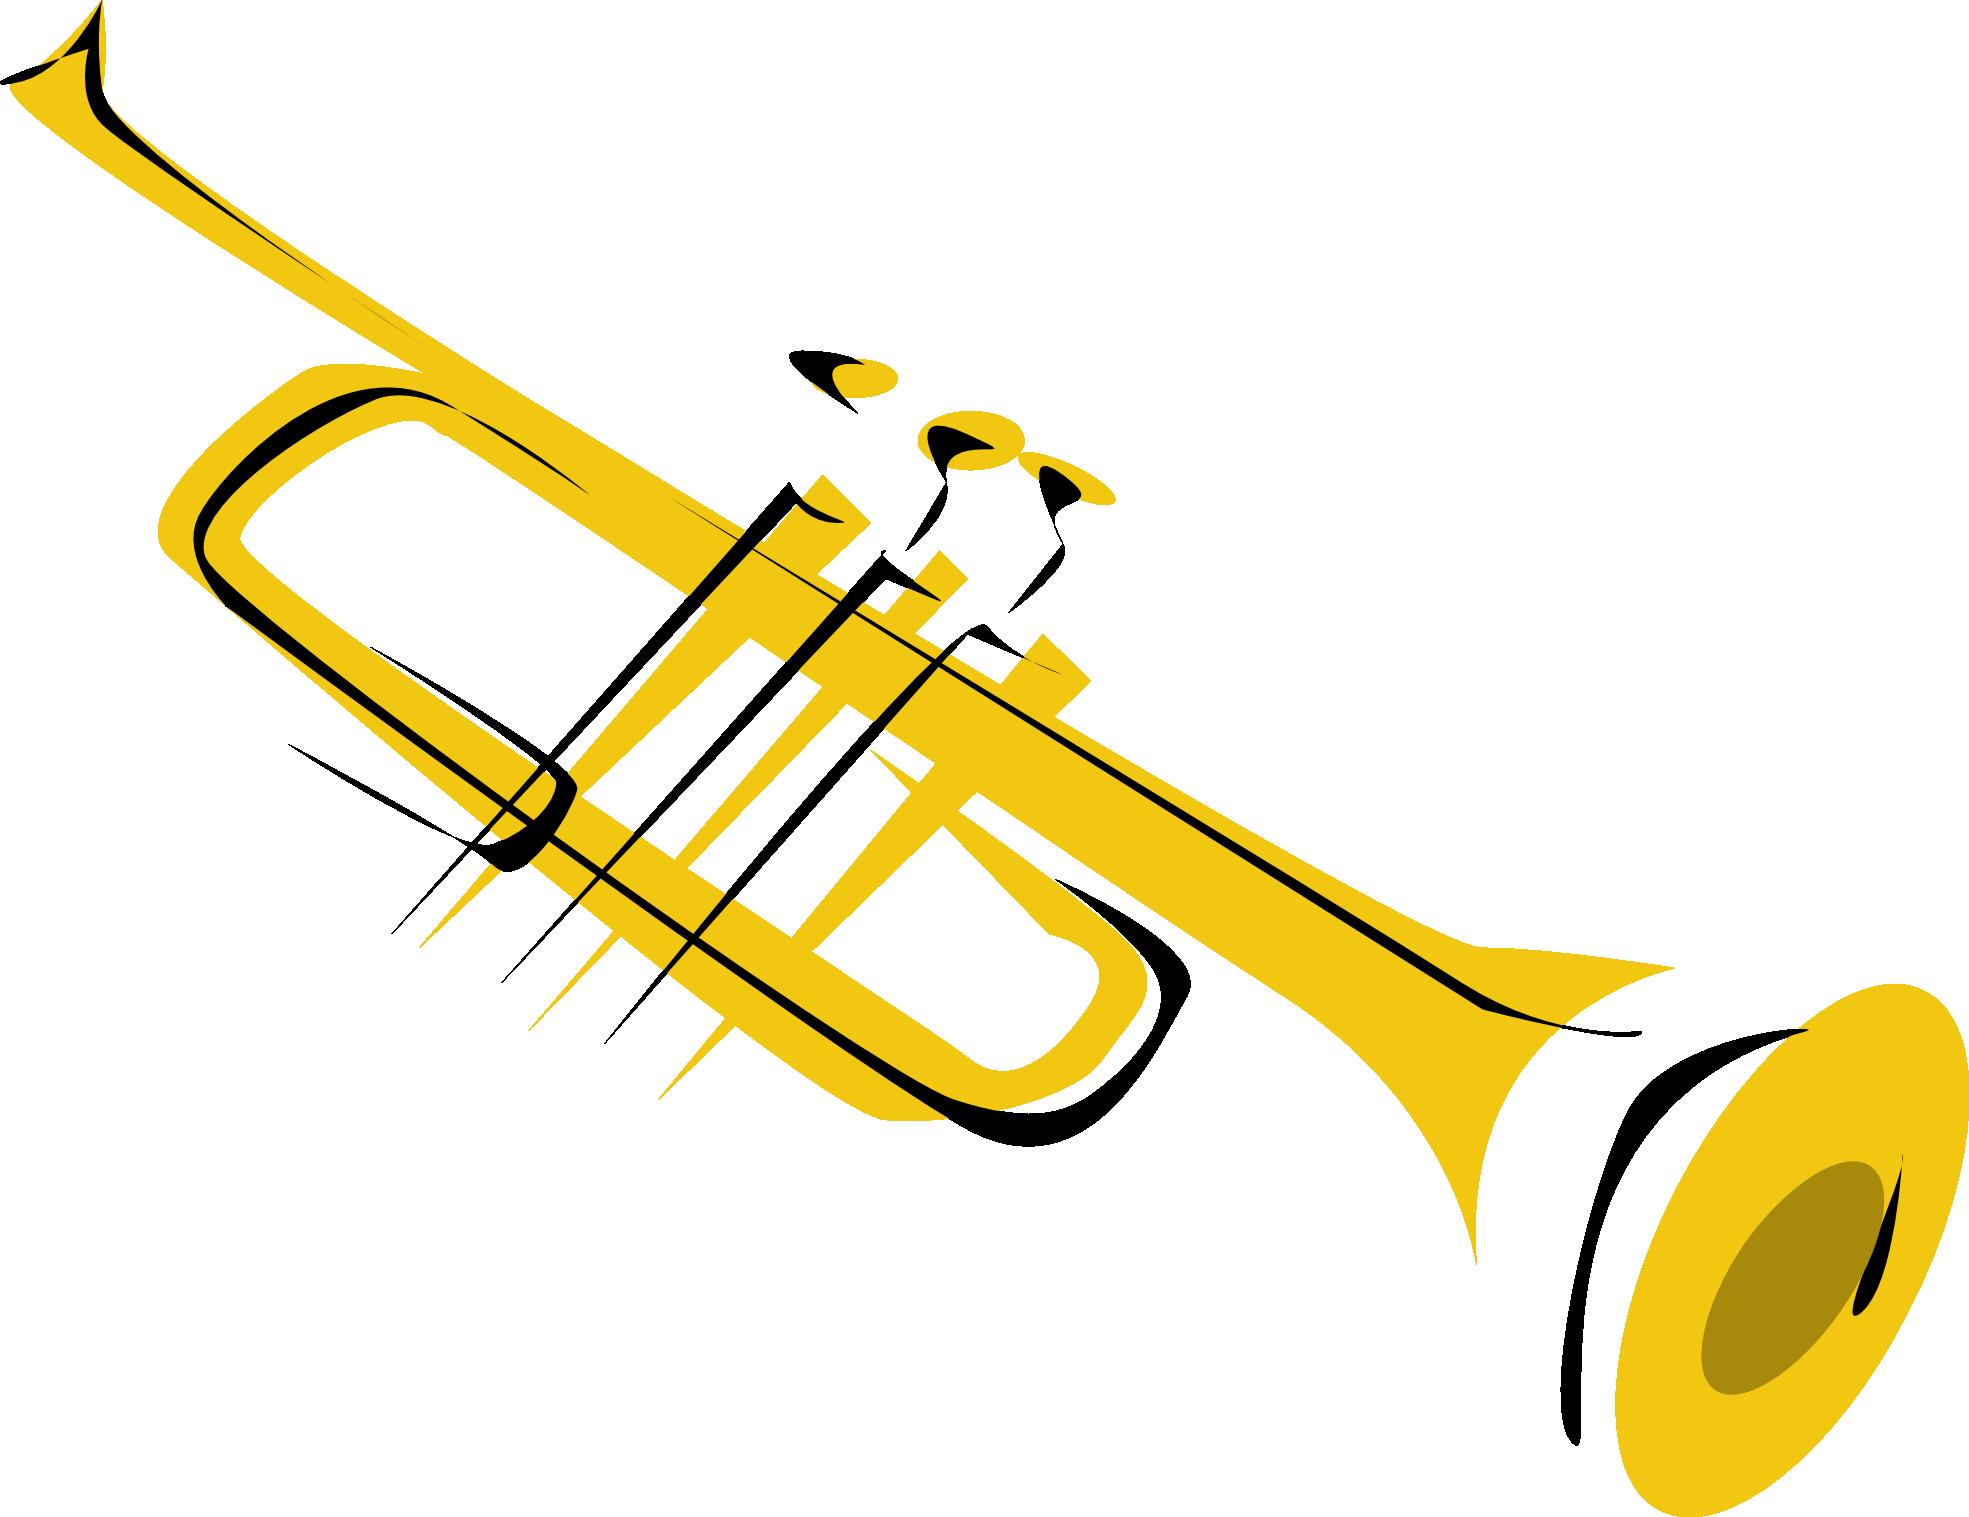 Trumpet clip art free clipart images 4